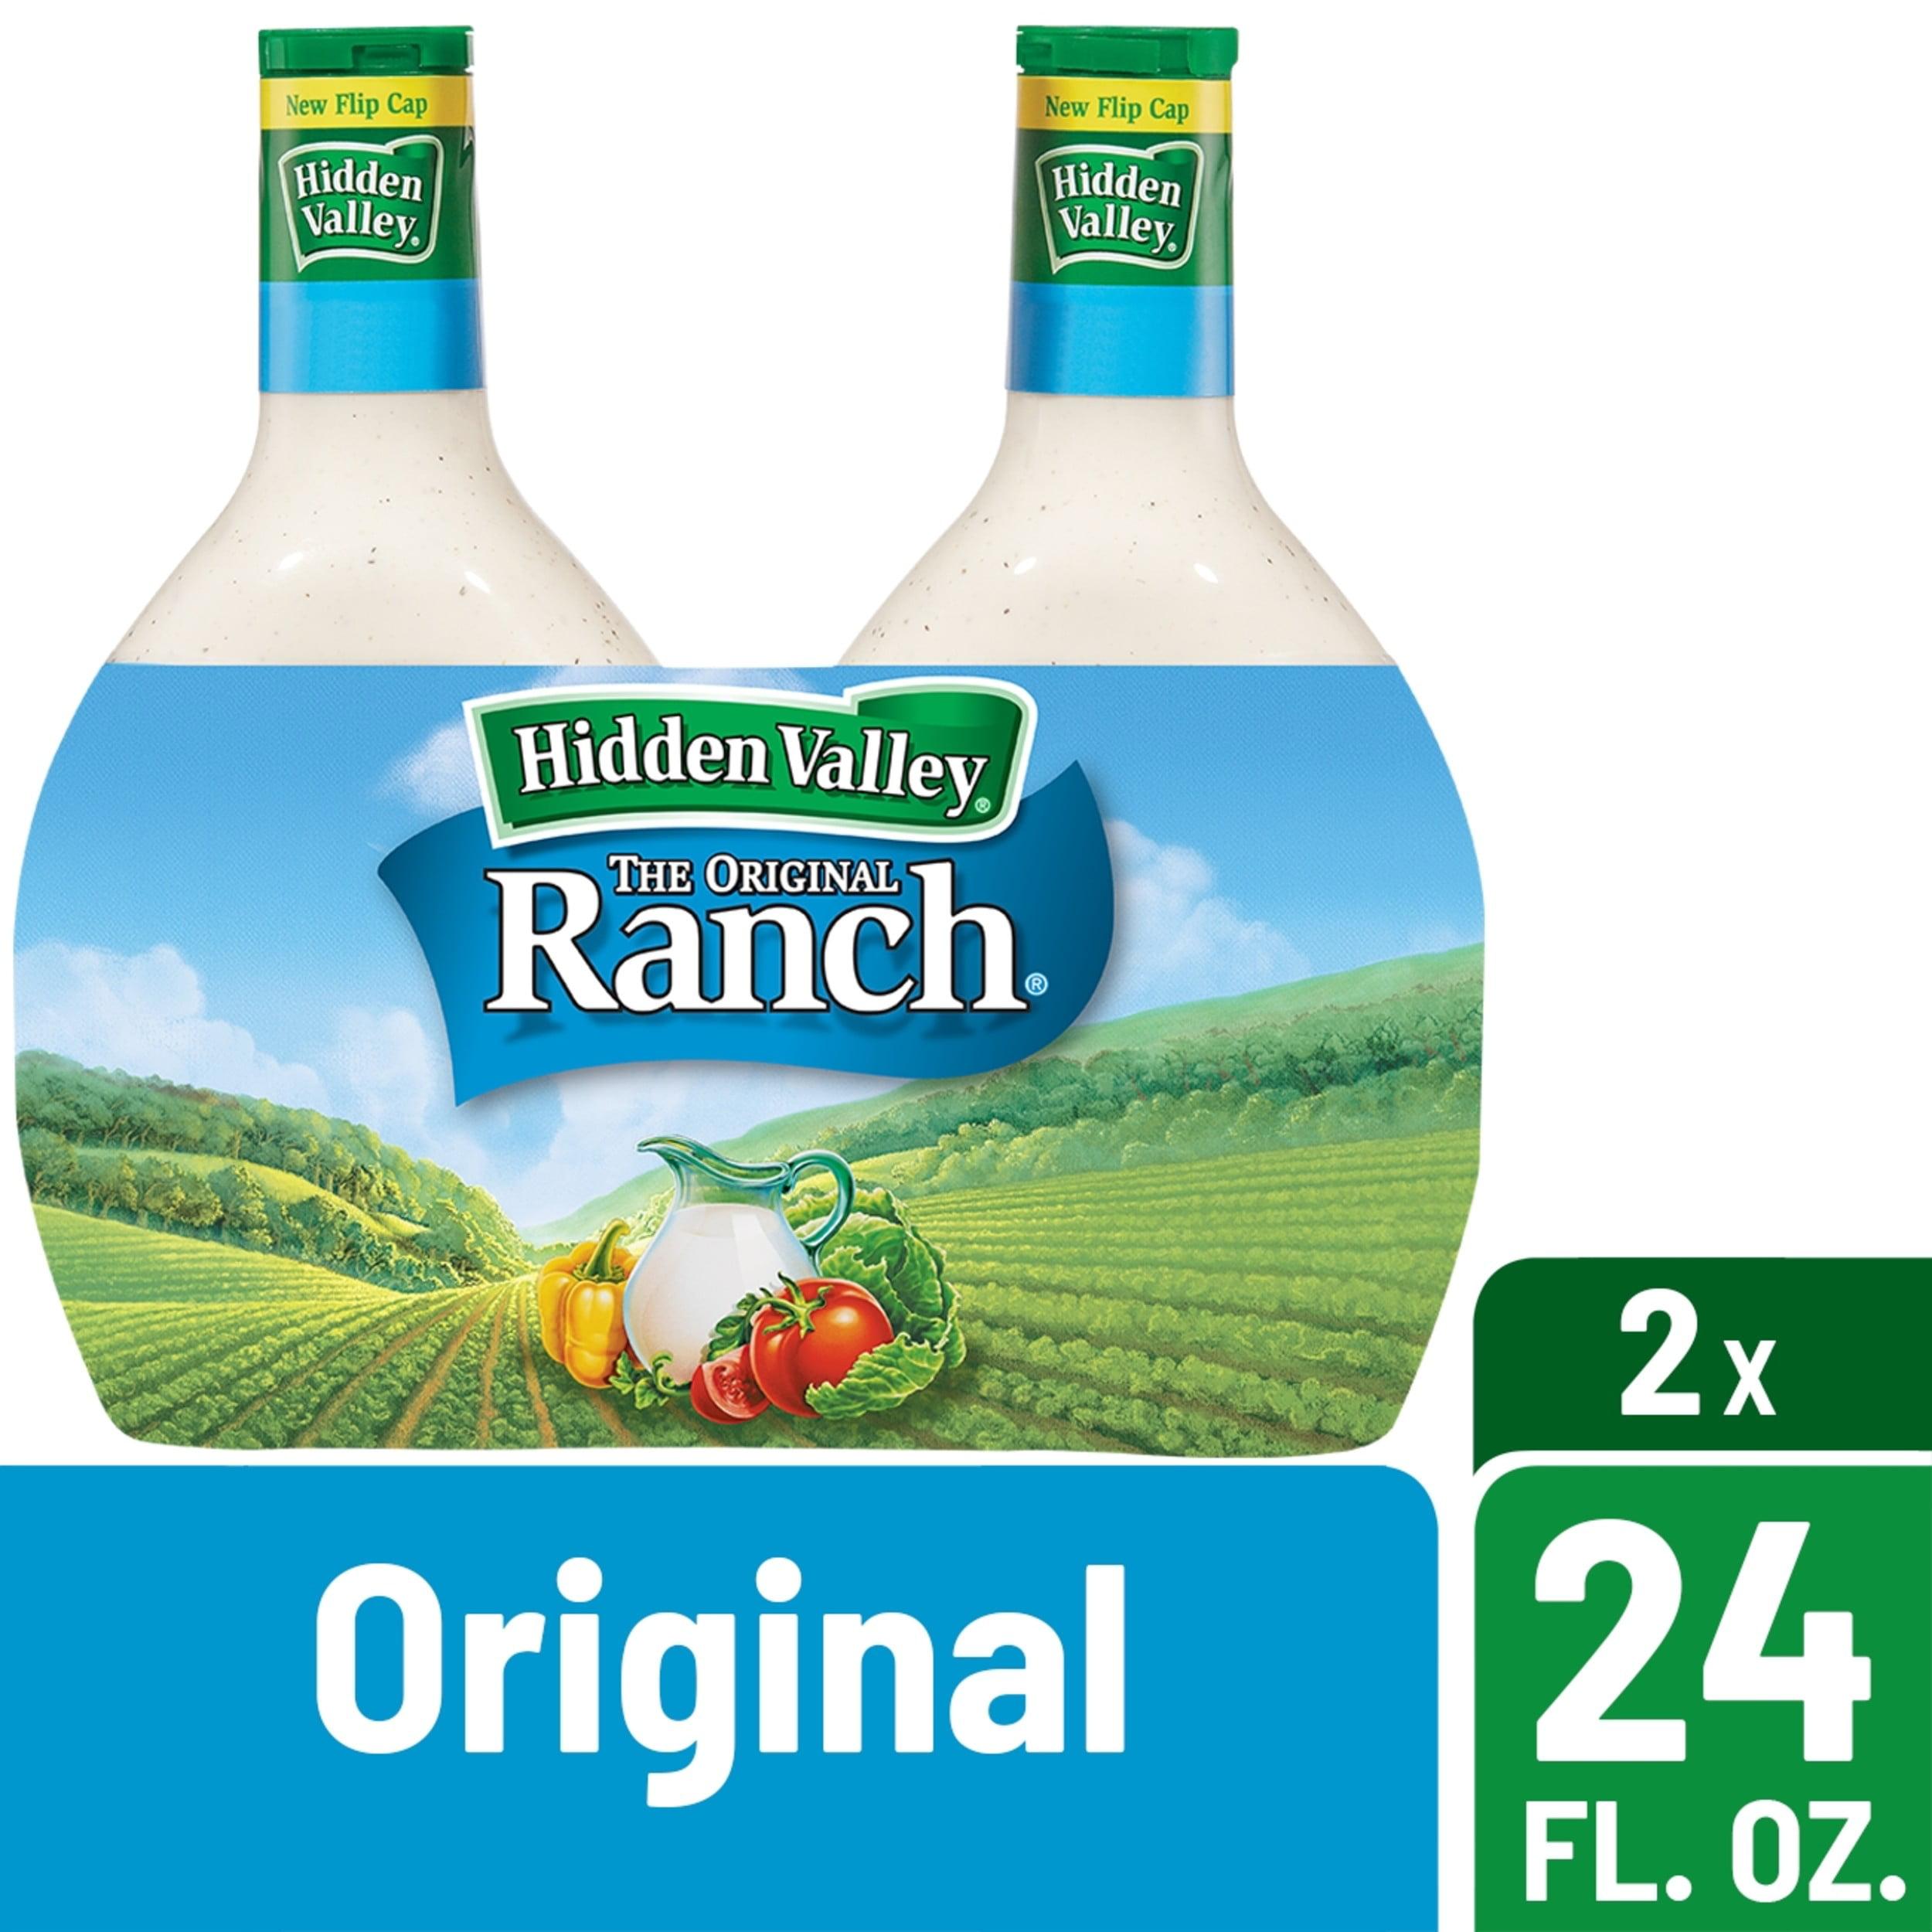 Hidden Valley Original Ranch Salad Dressing & Topping - Gluten Free - 24fl oz/2pk